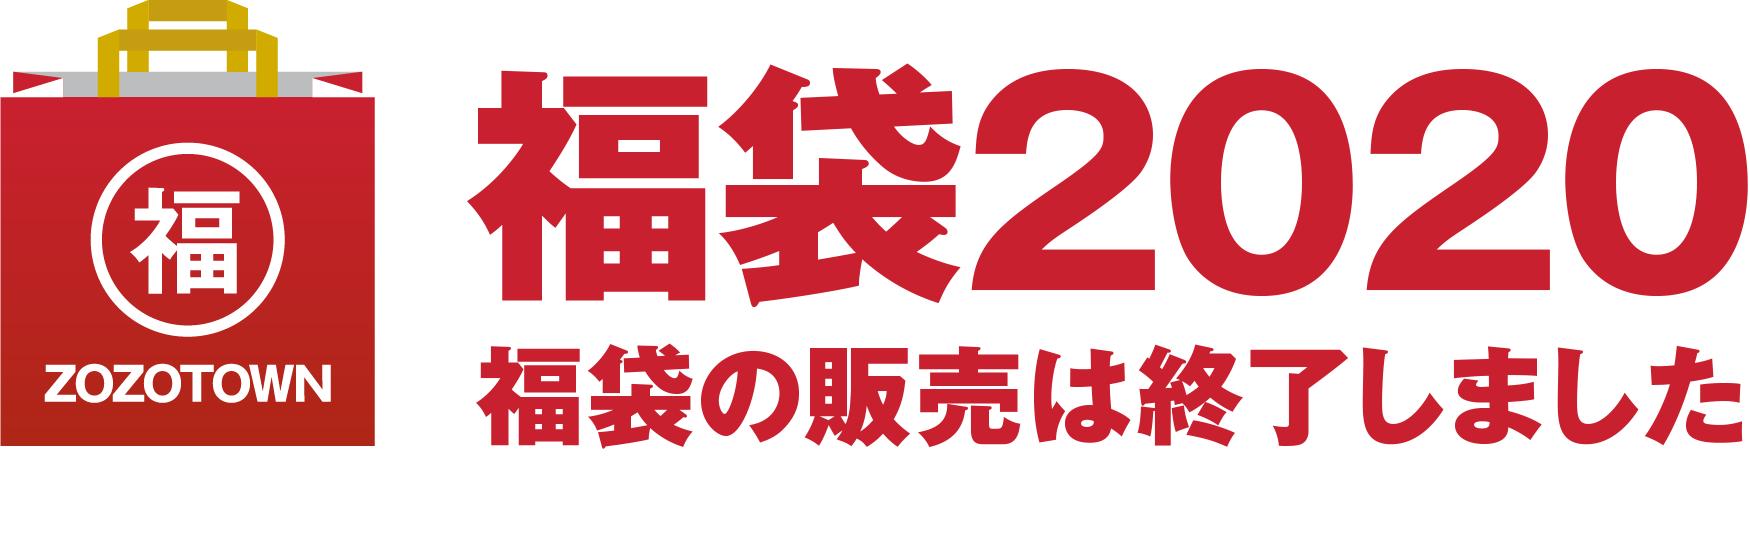 ZOZO福袋2020 福袋の販売は終了しました